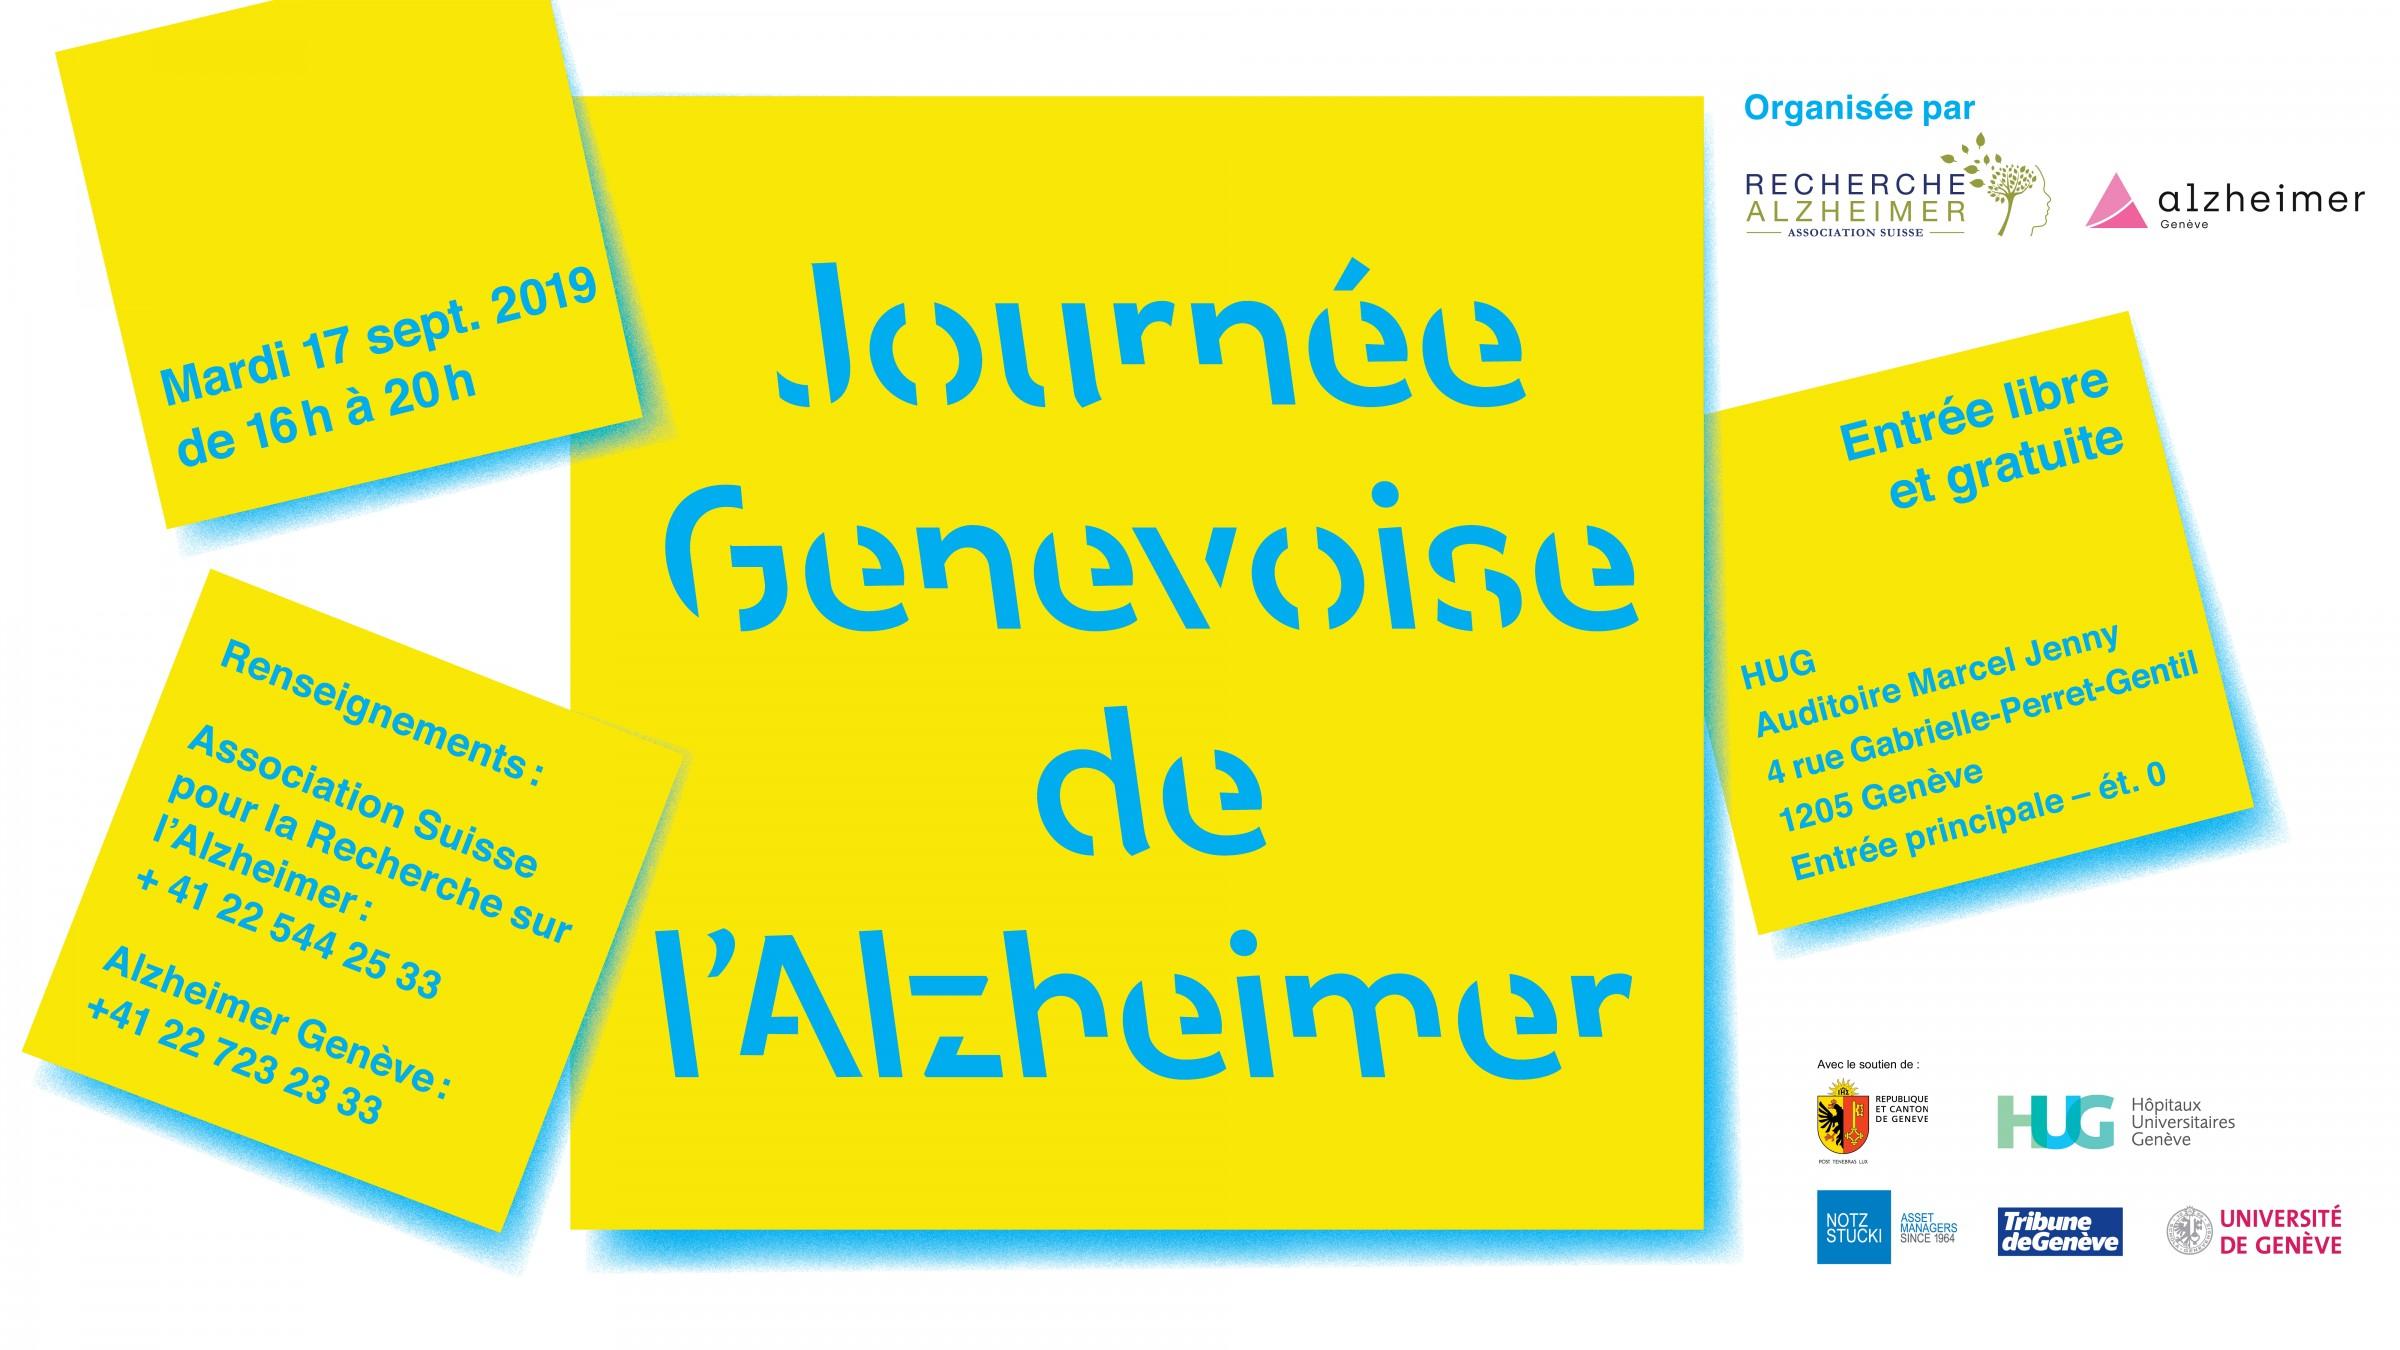 Journée Genevoise de l'Alzheimer